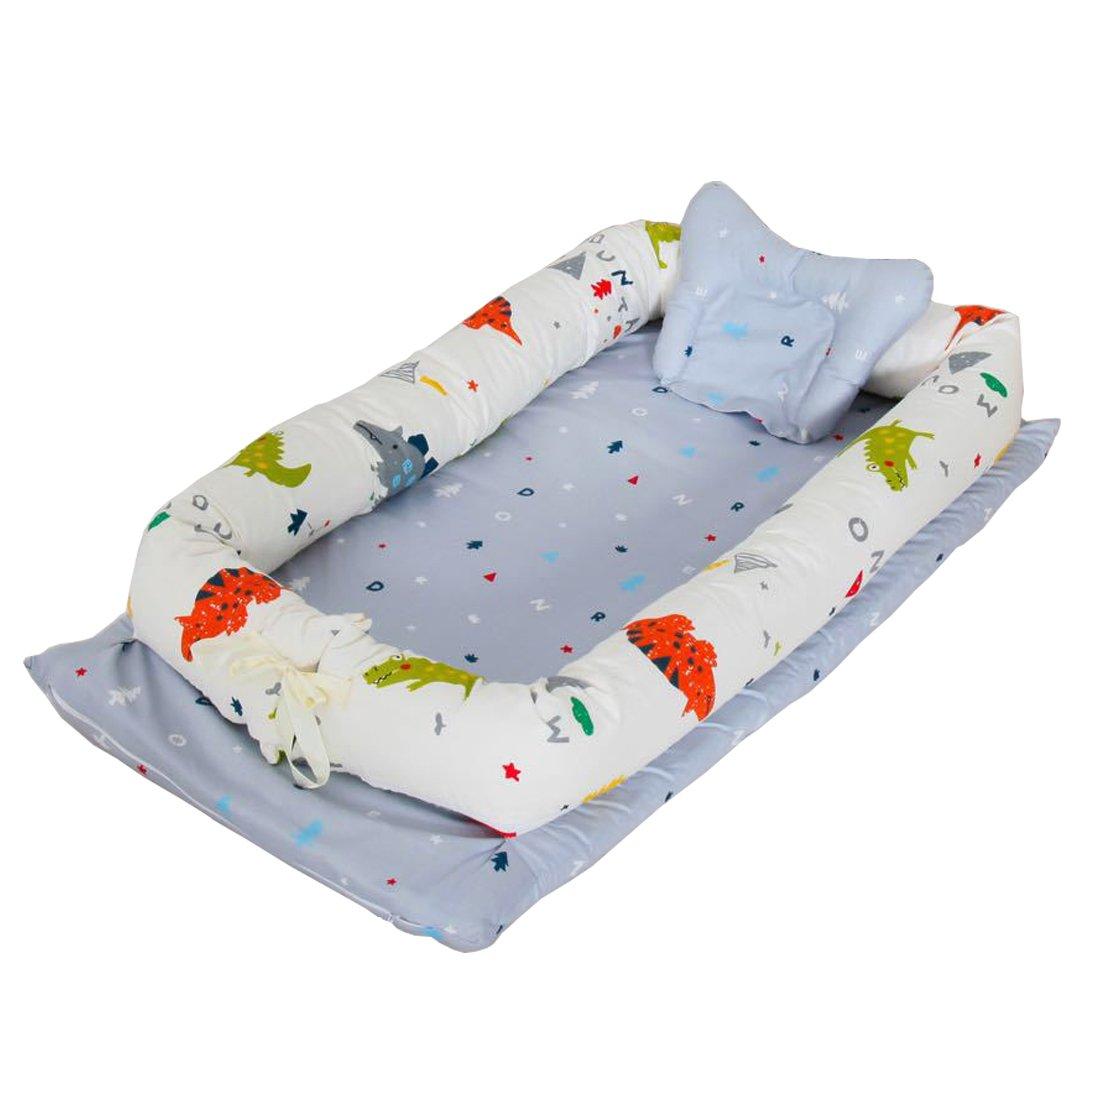 DorkasDE Babynest Kuschelnest Faltbett tragbar Babybett Reisebett (one size, Blau)